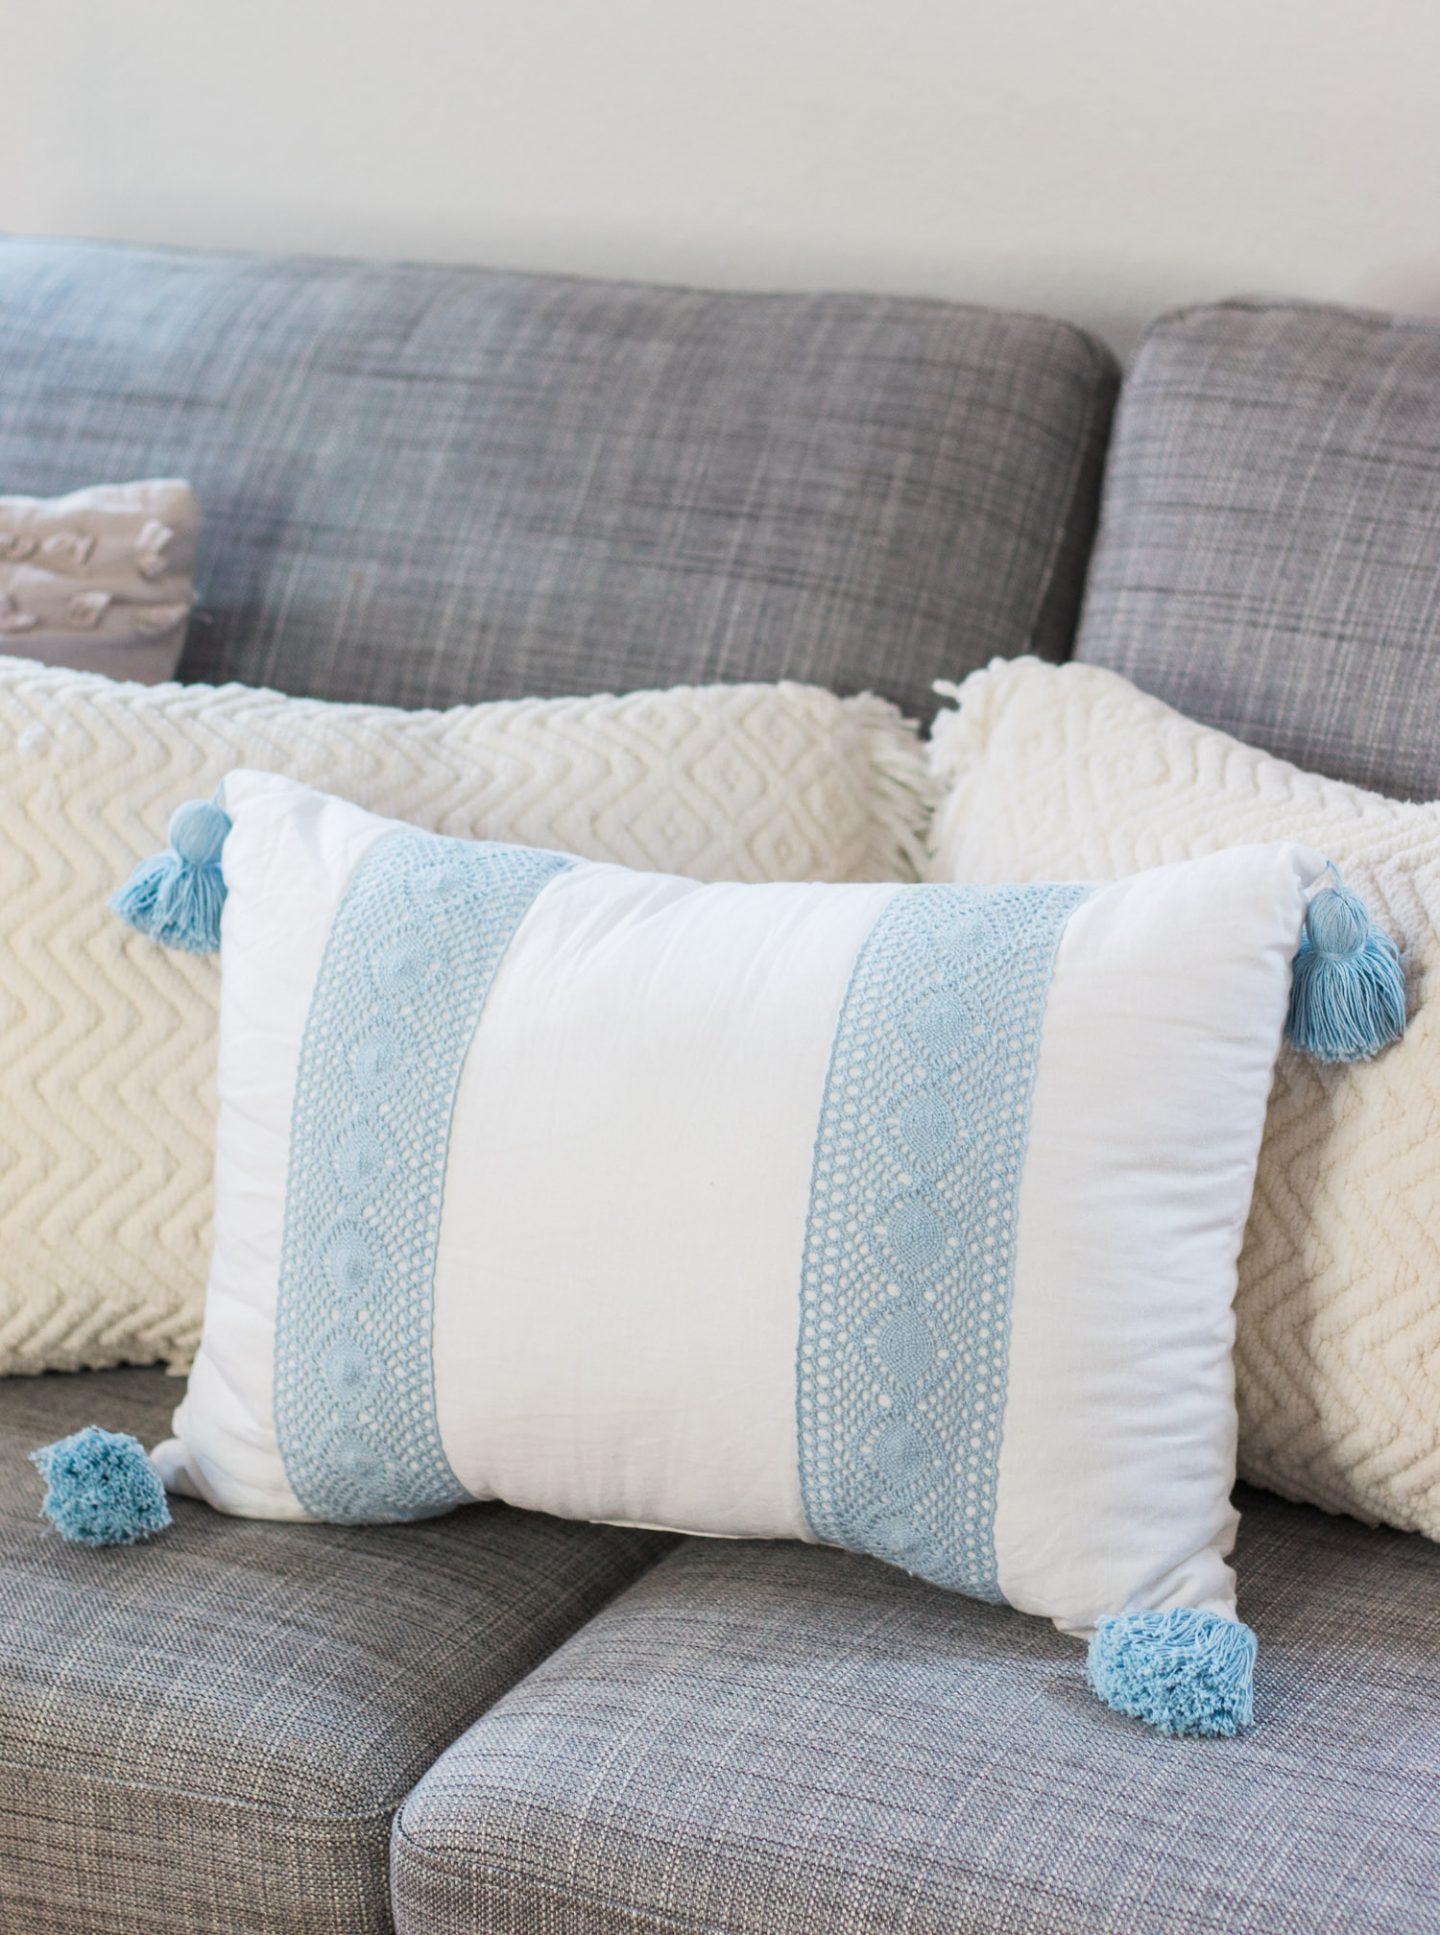 valspar home office tour ashley brooke nicholas cute office target pillows tassells